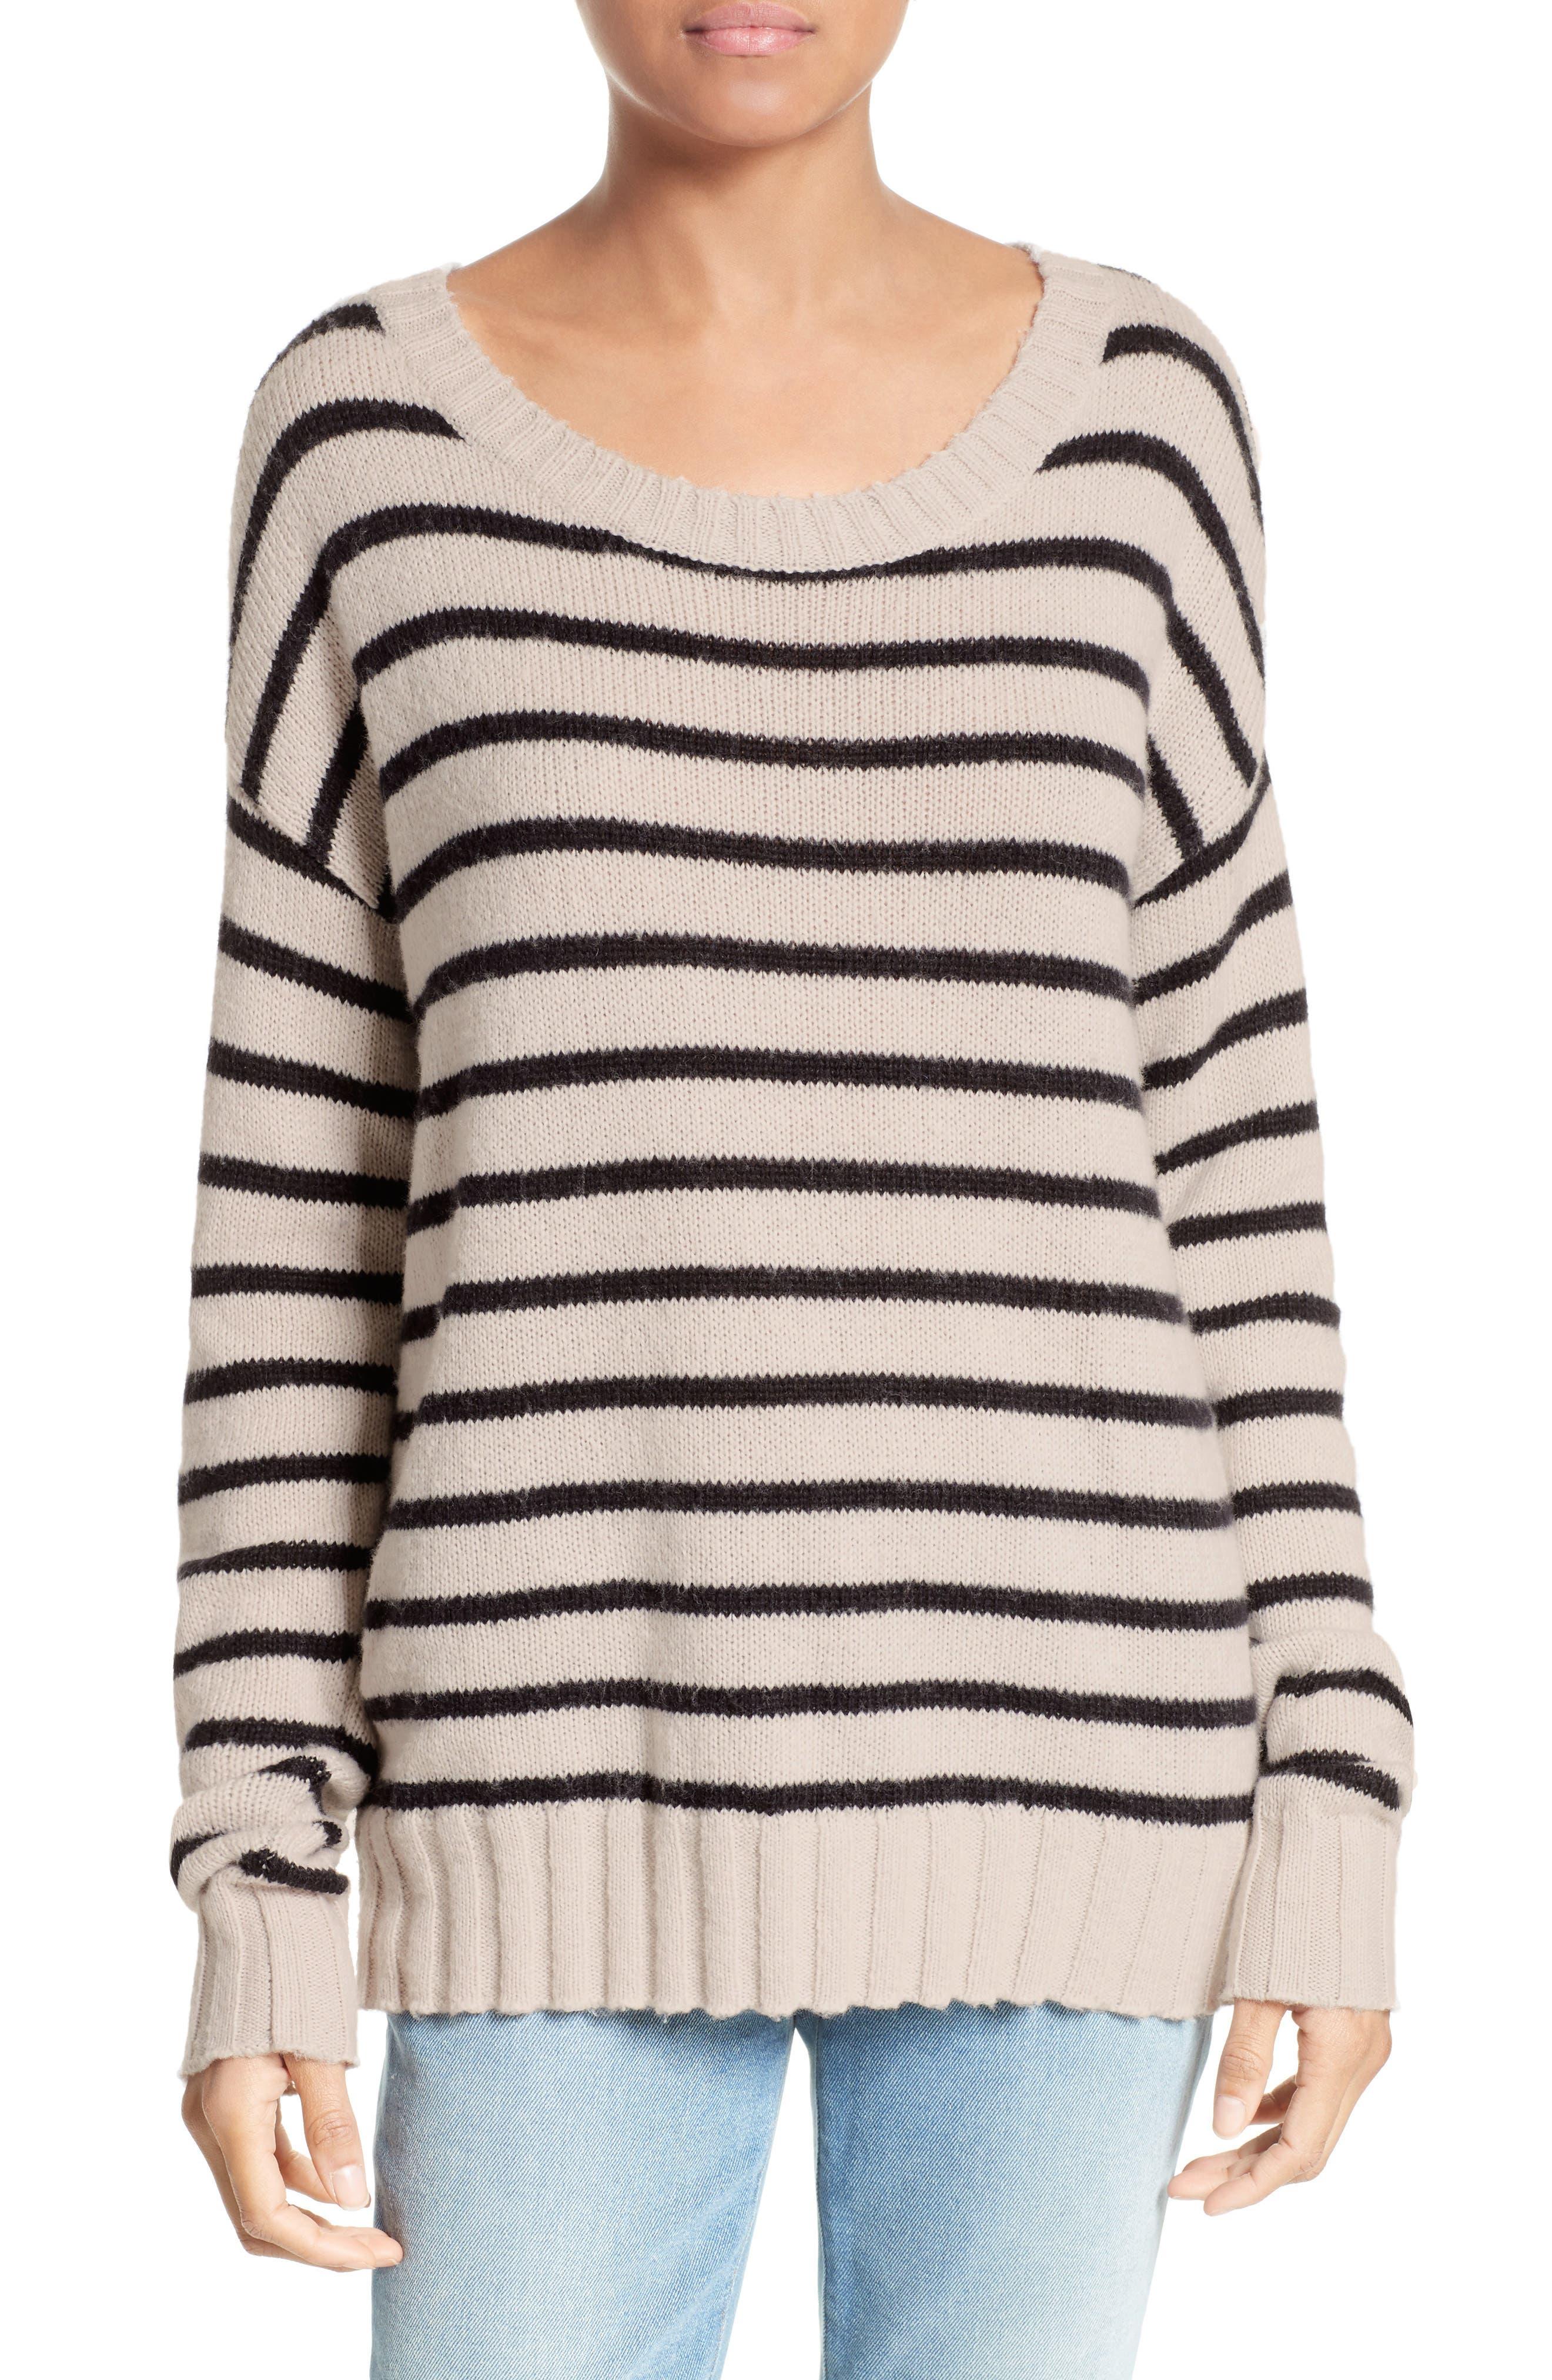 Rowan Stripe Cotton Blend Sweater,                         Main,                         color, Beige/ Black